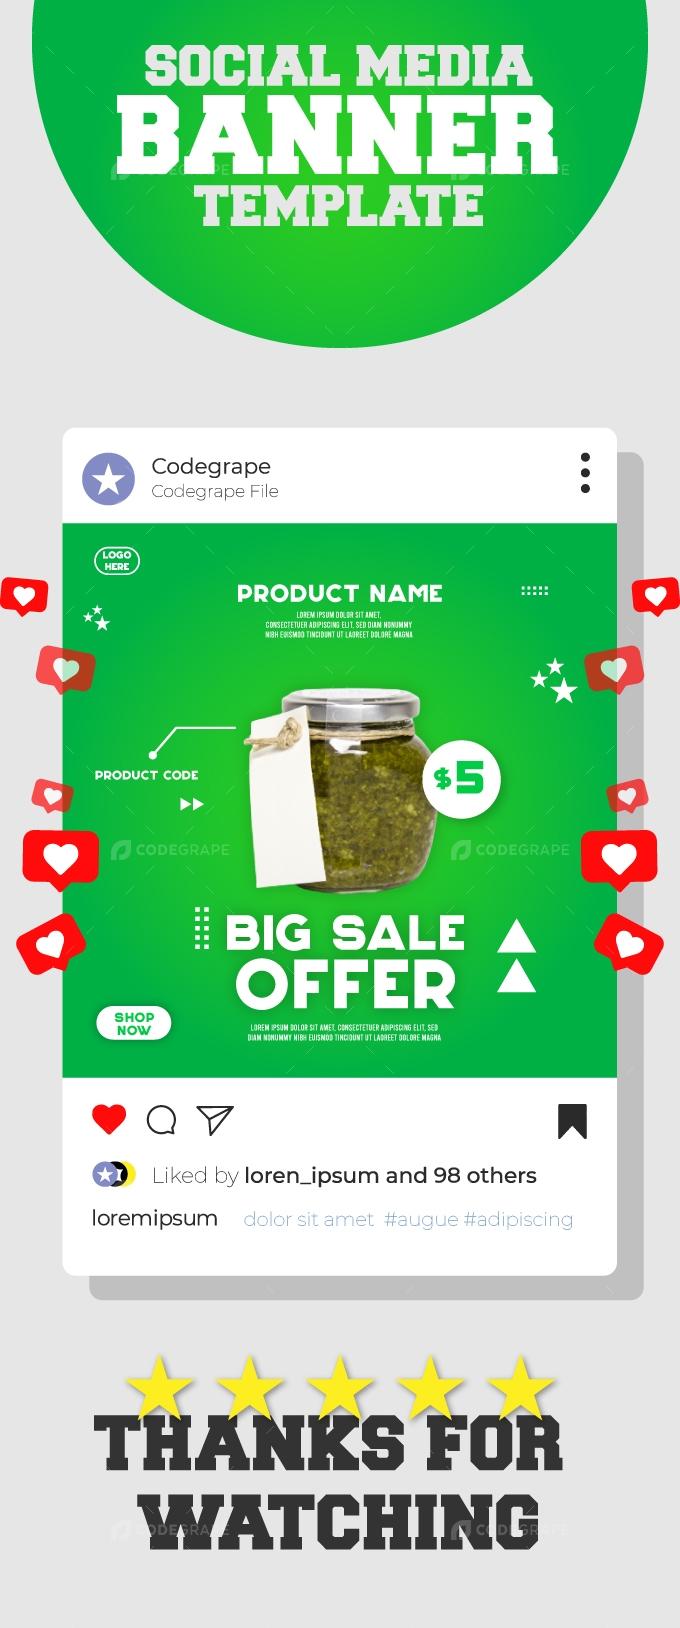 Big Sale Offer Social Media Template